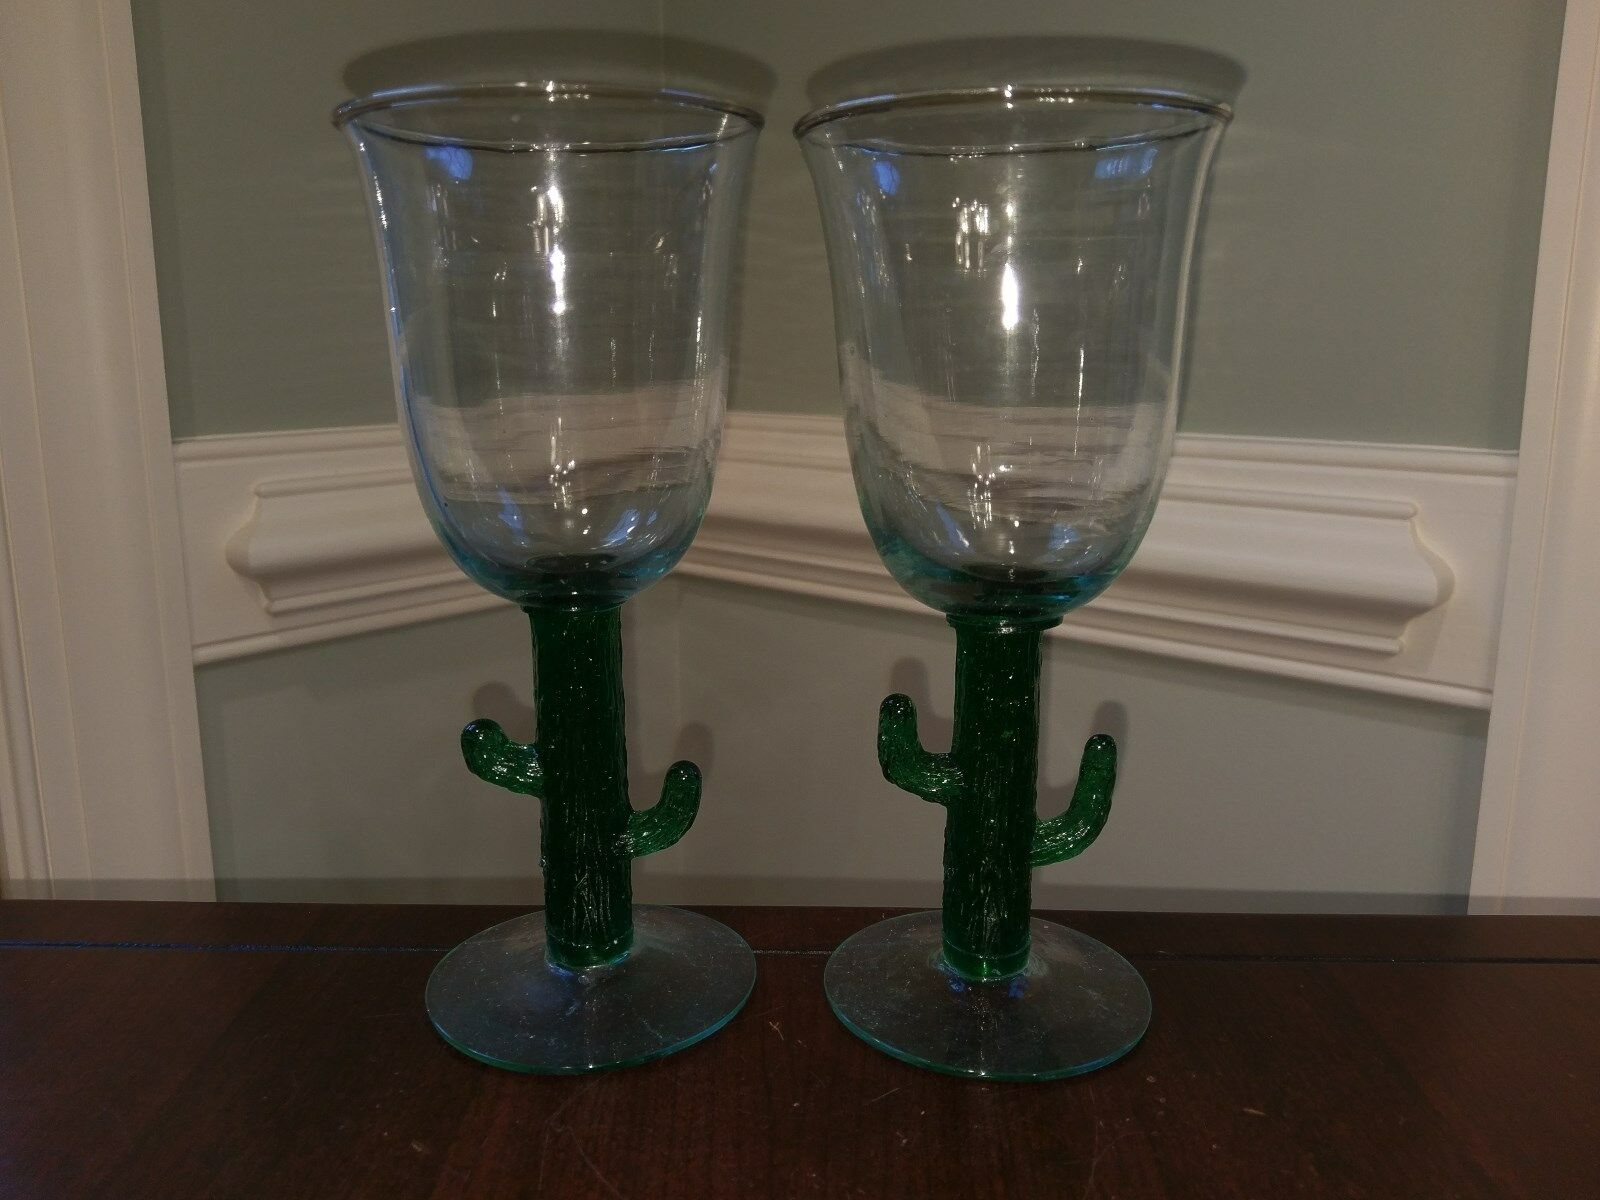 2 Handblown Margarita Wine Glasses Grün Grün Grün Saguaro Cactus Stem Handmade in Mexico 342947